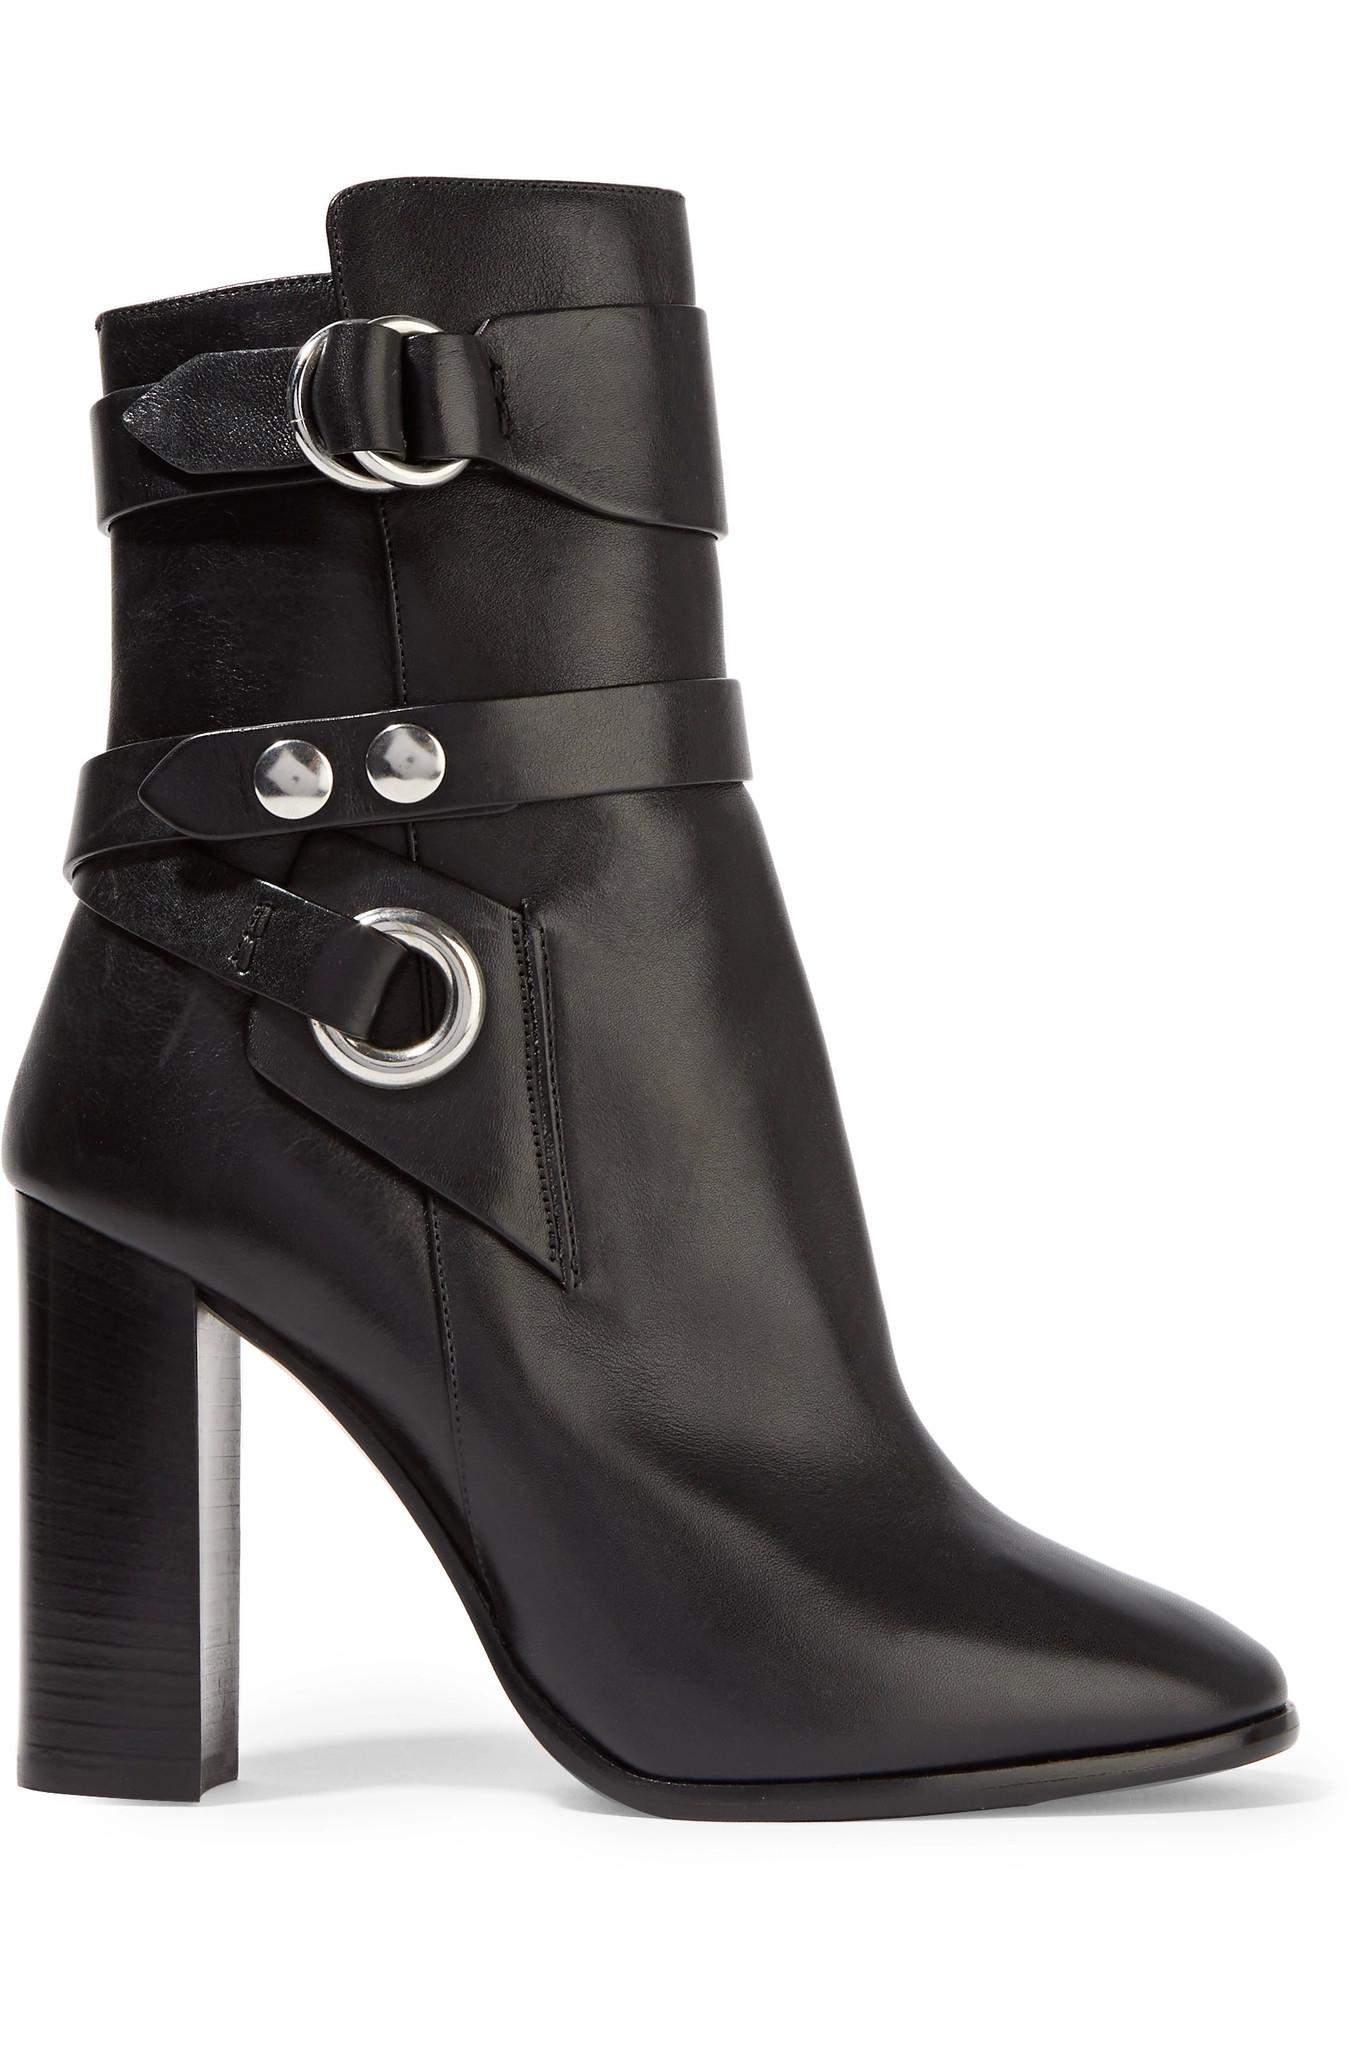 isabel marant aspeyn leather ankle boots in black lyst. Black Bedroom Furniture Sets. Home Design Ideas